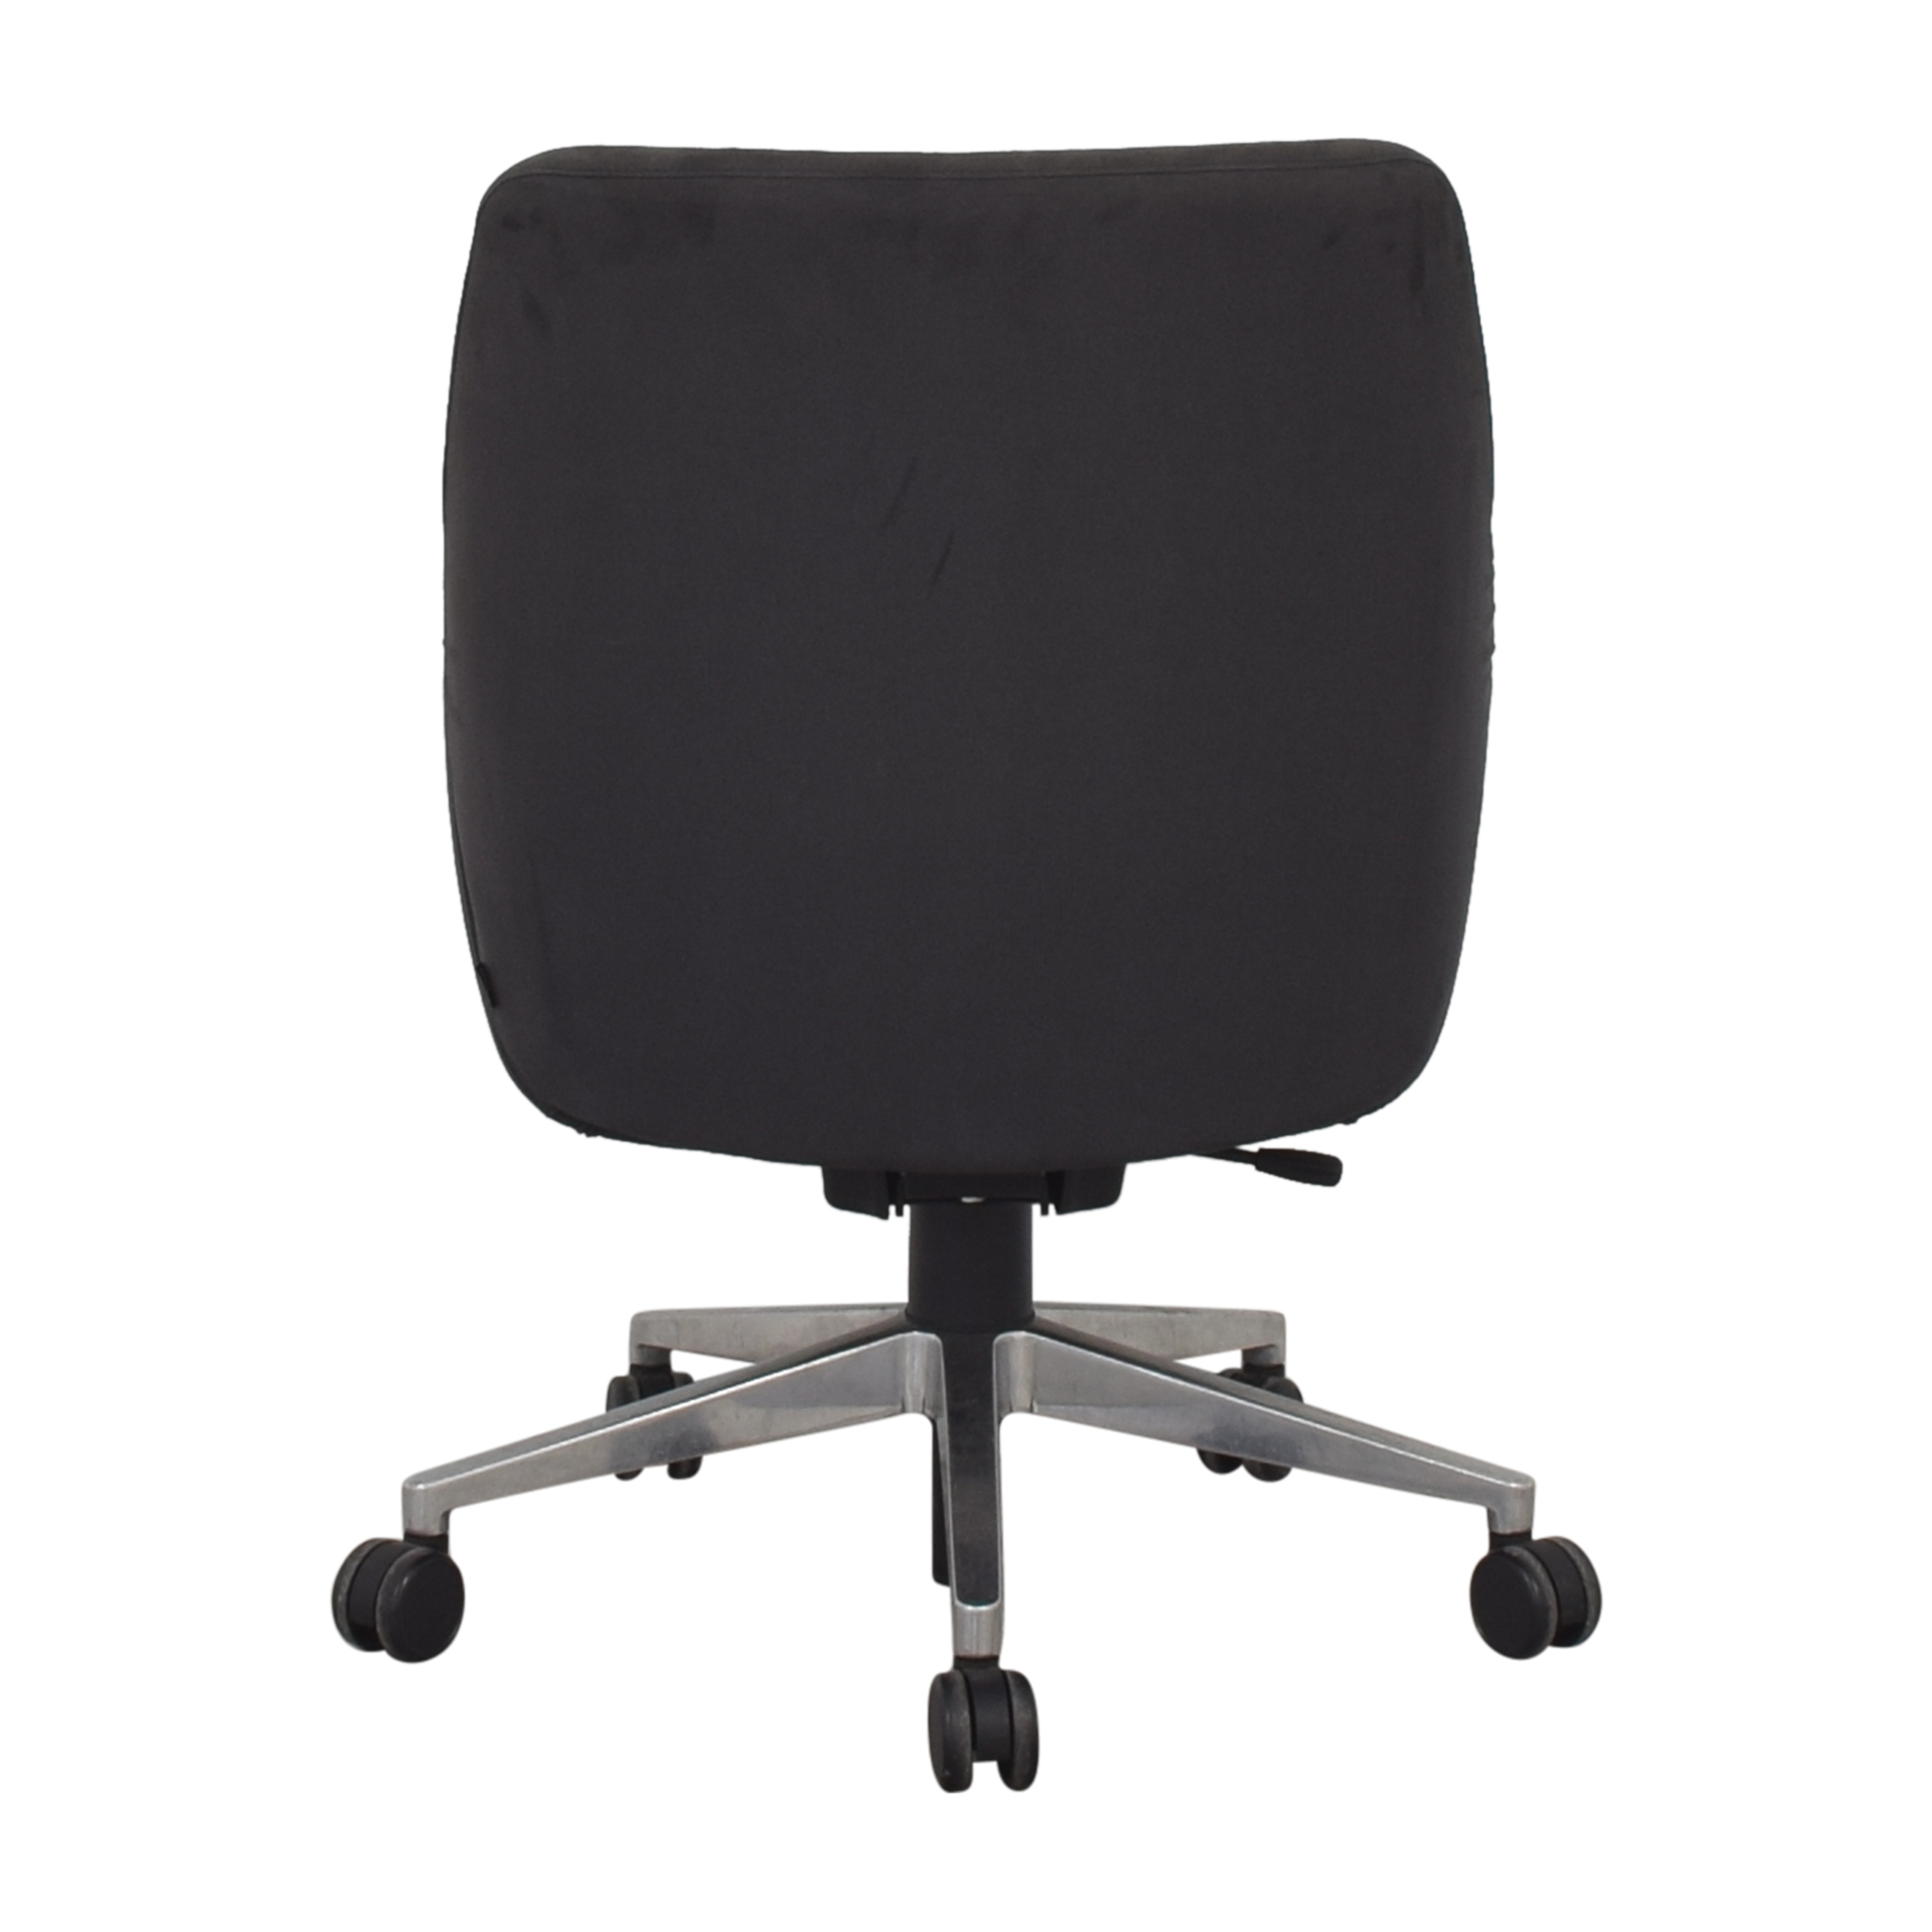 Steelcase Steelcase Coalesse Bindu Guest Chair ma